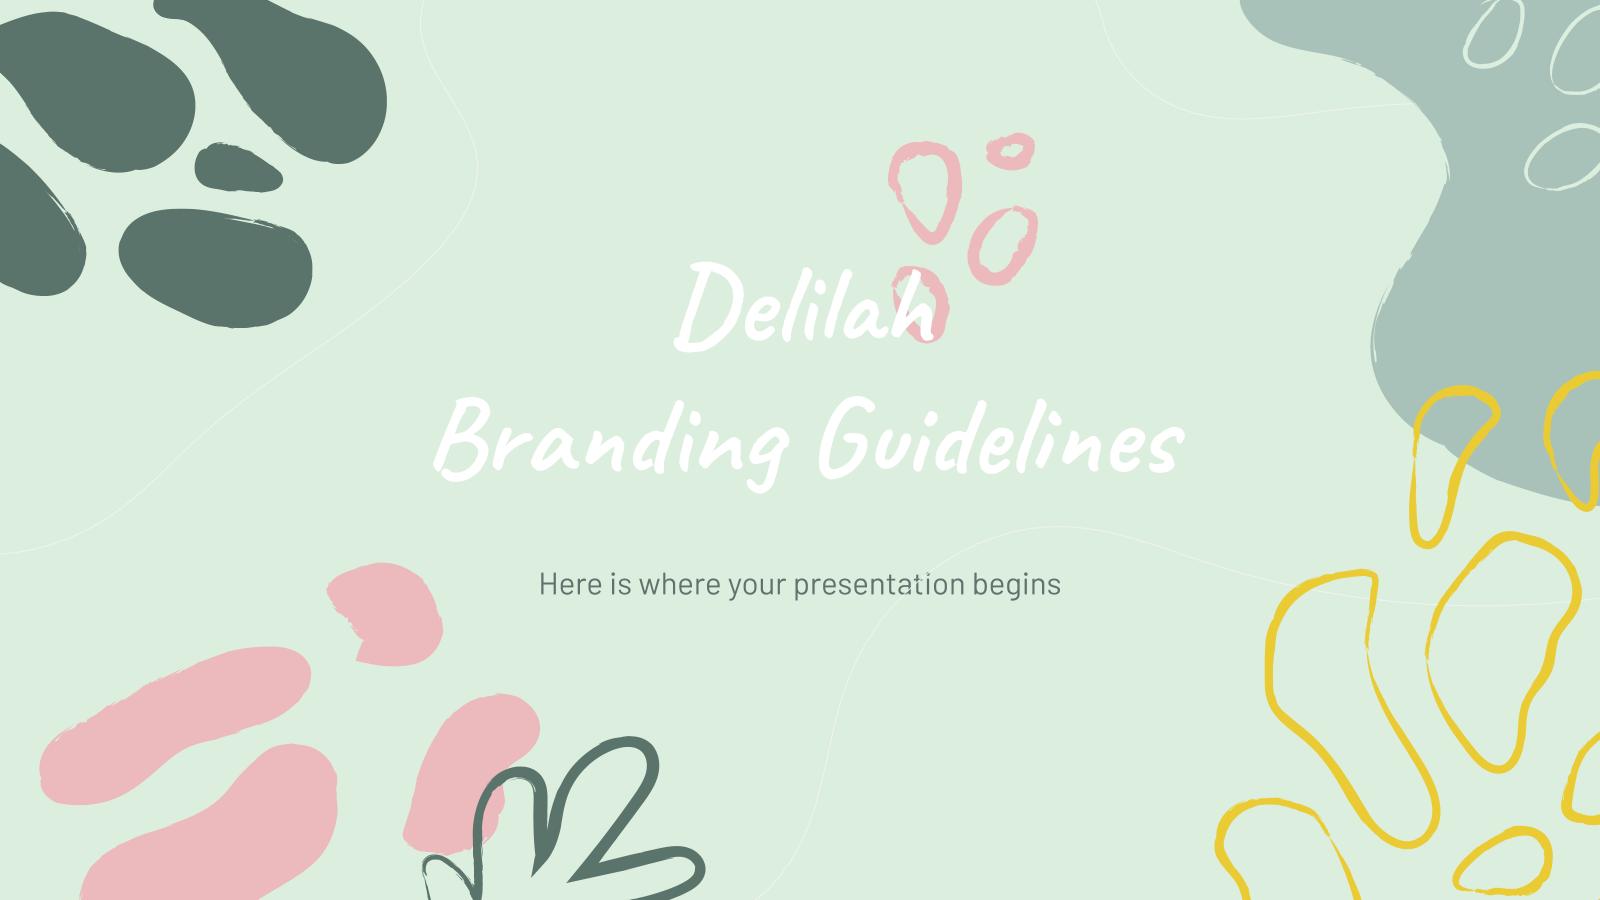 Delilah Branding Guidelines presentation template